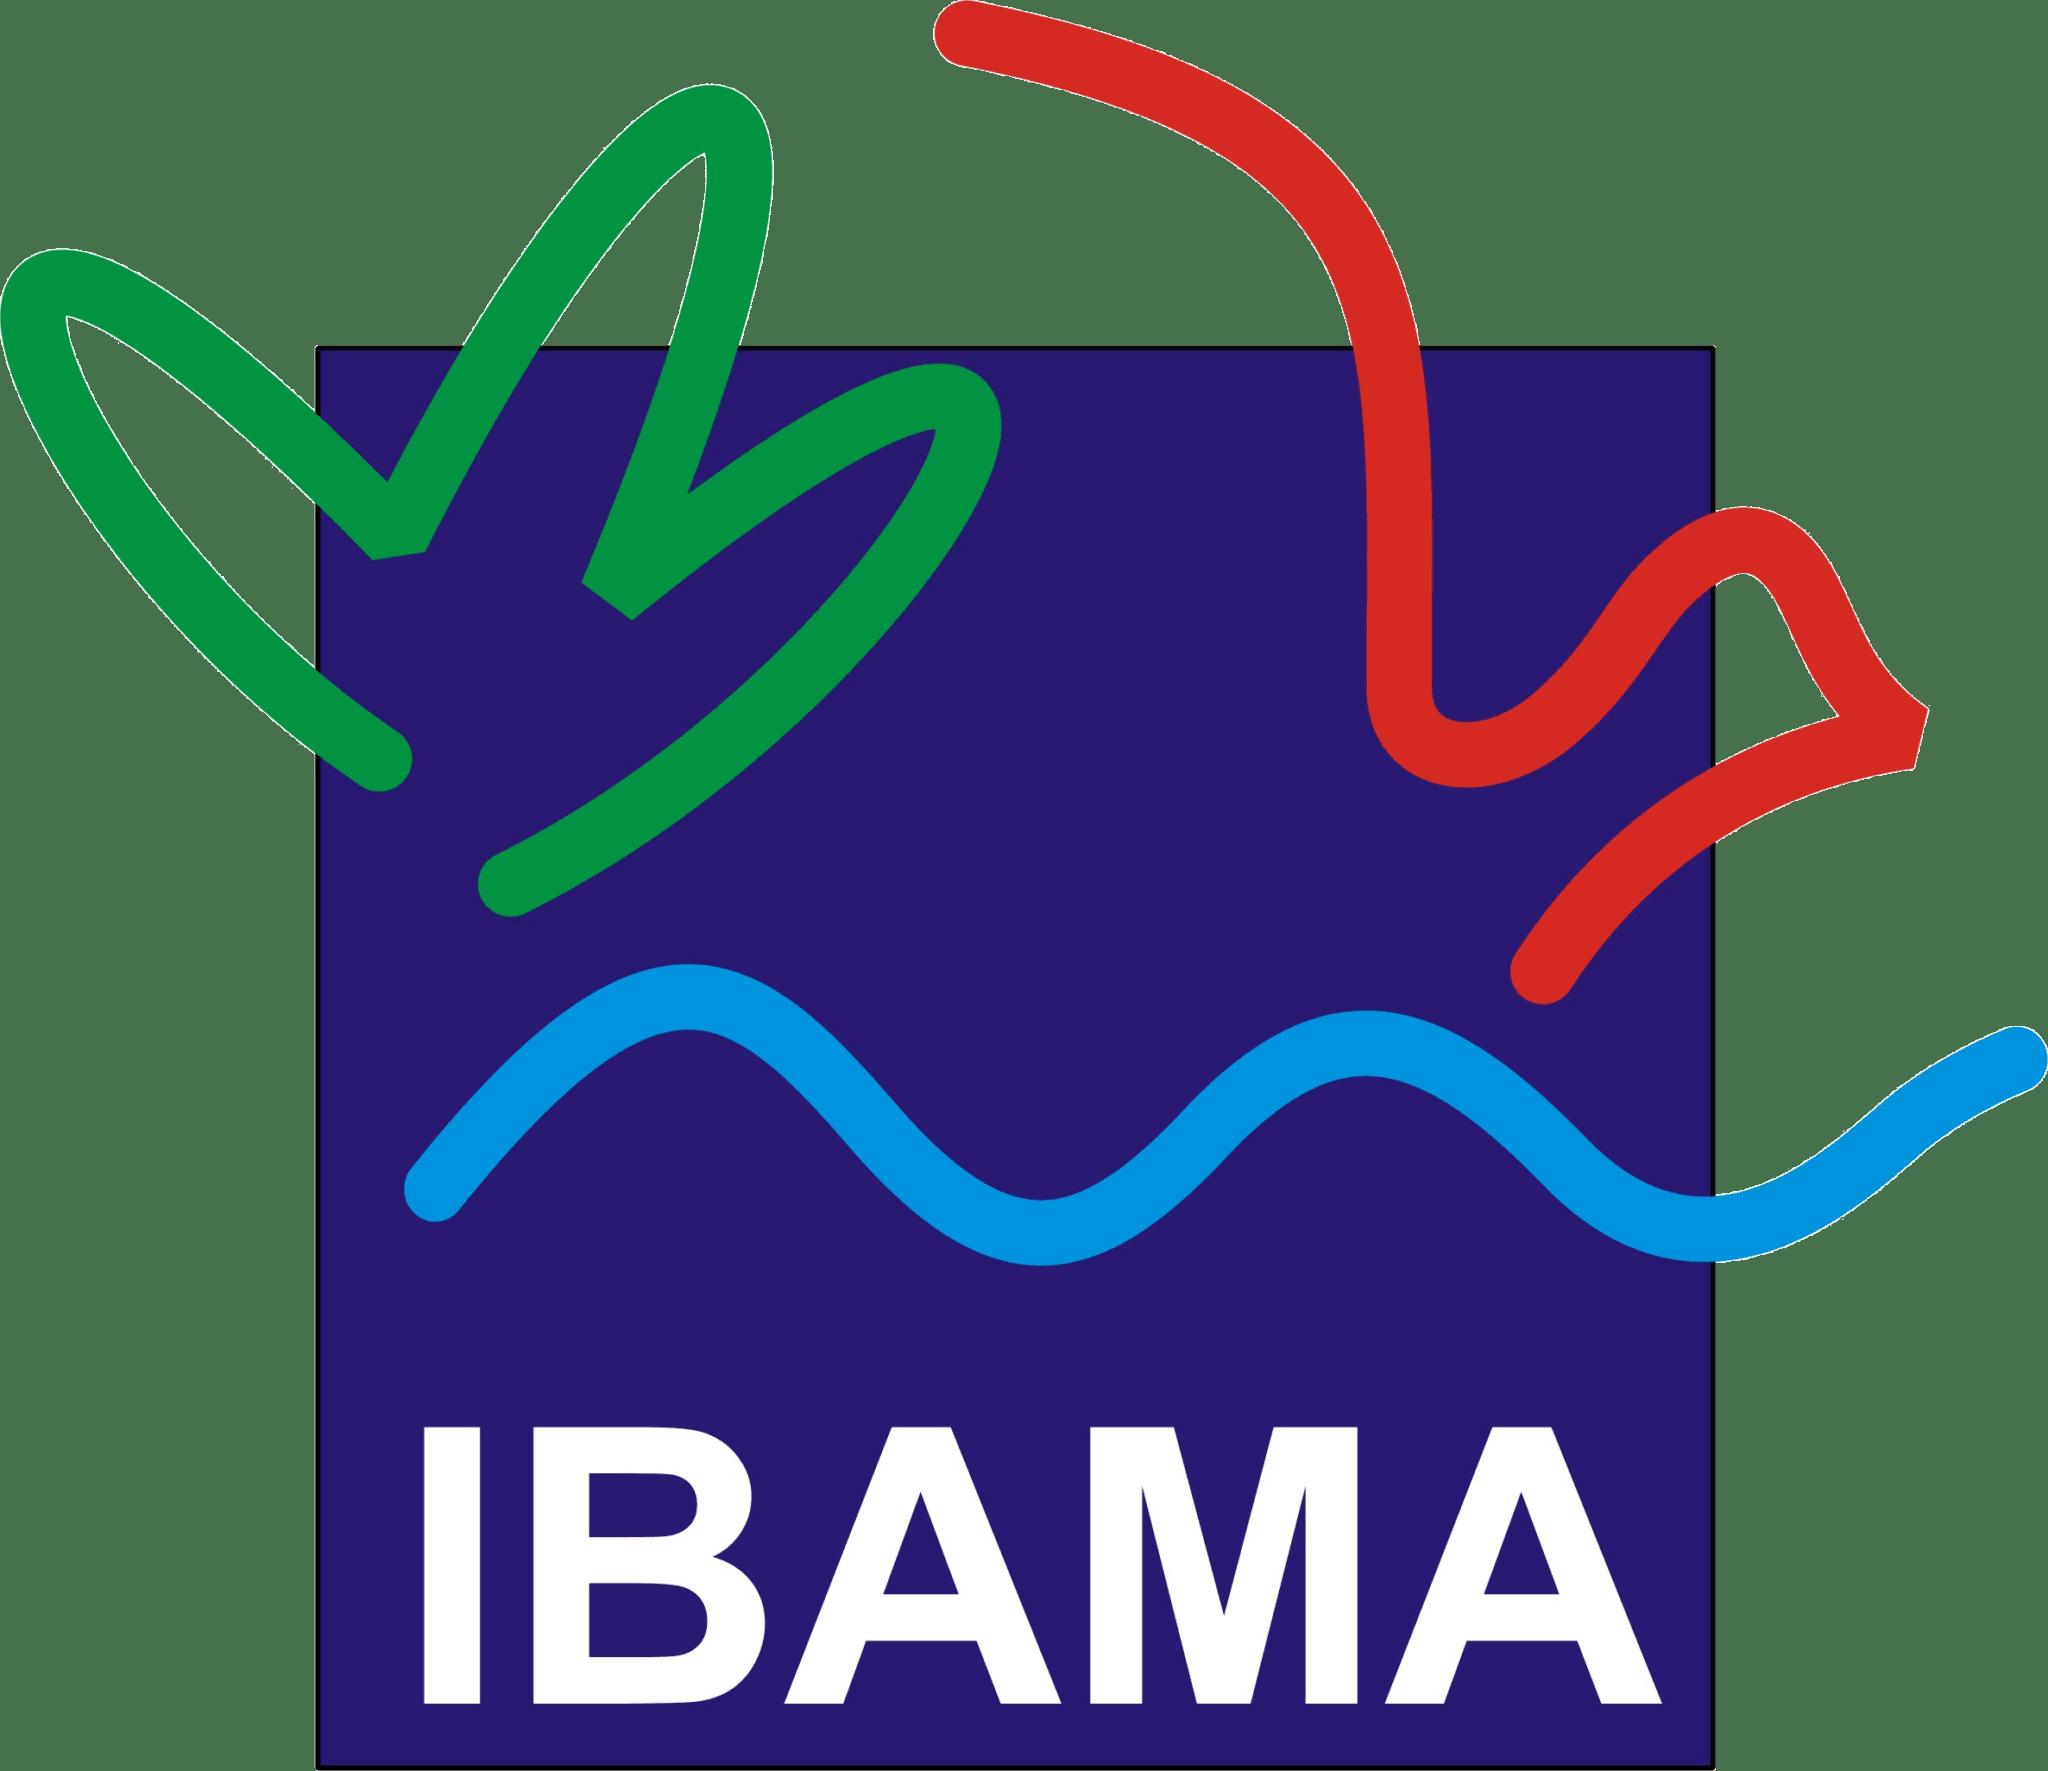 Traduzindo o Edital do IBAMA - 2013